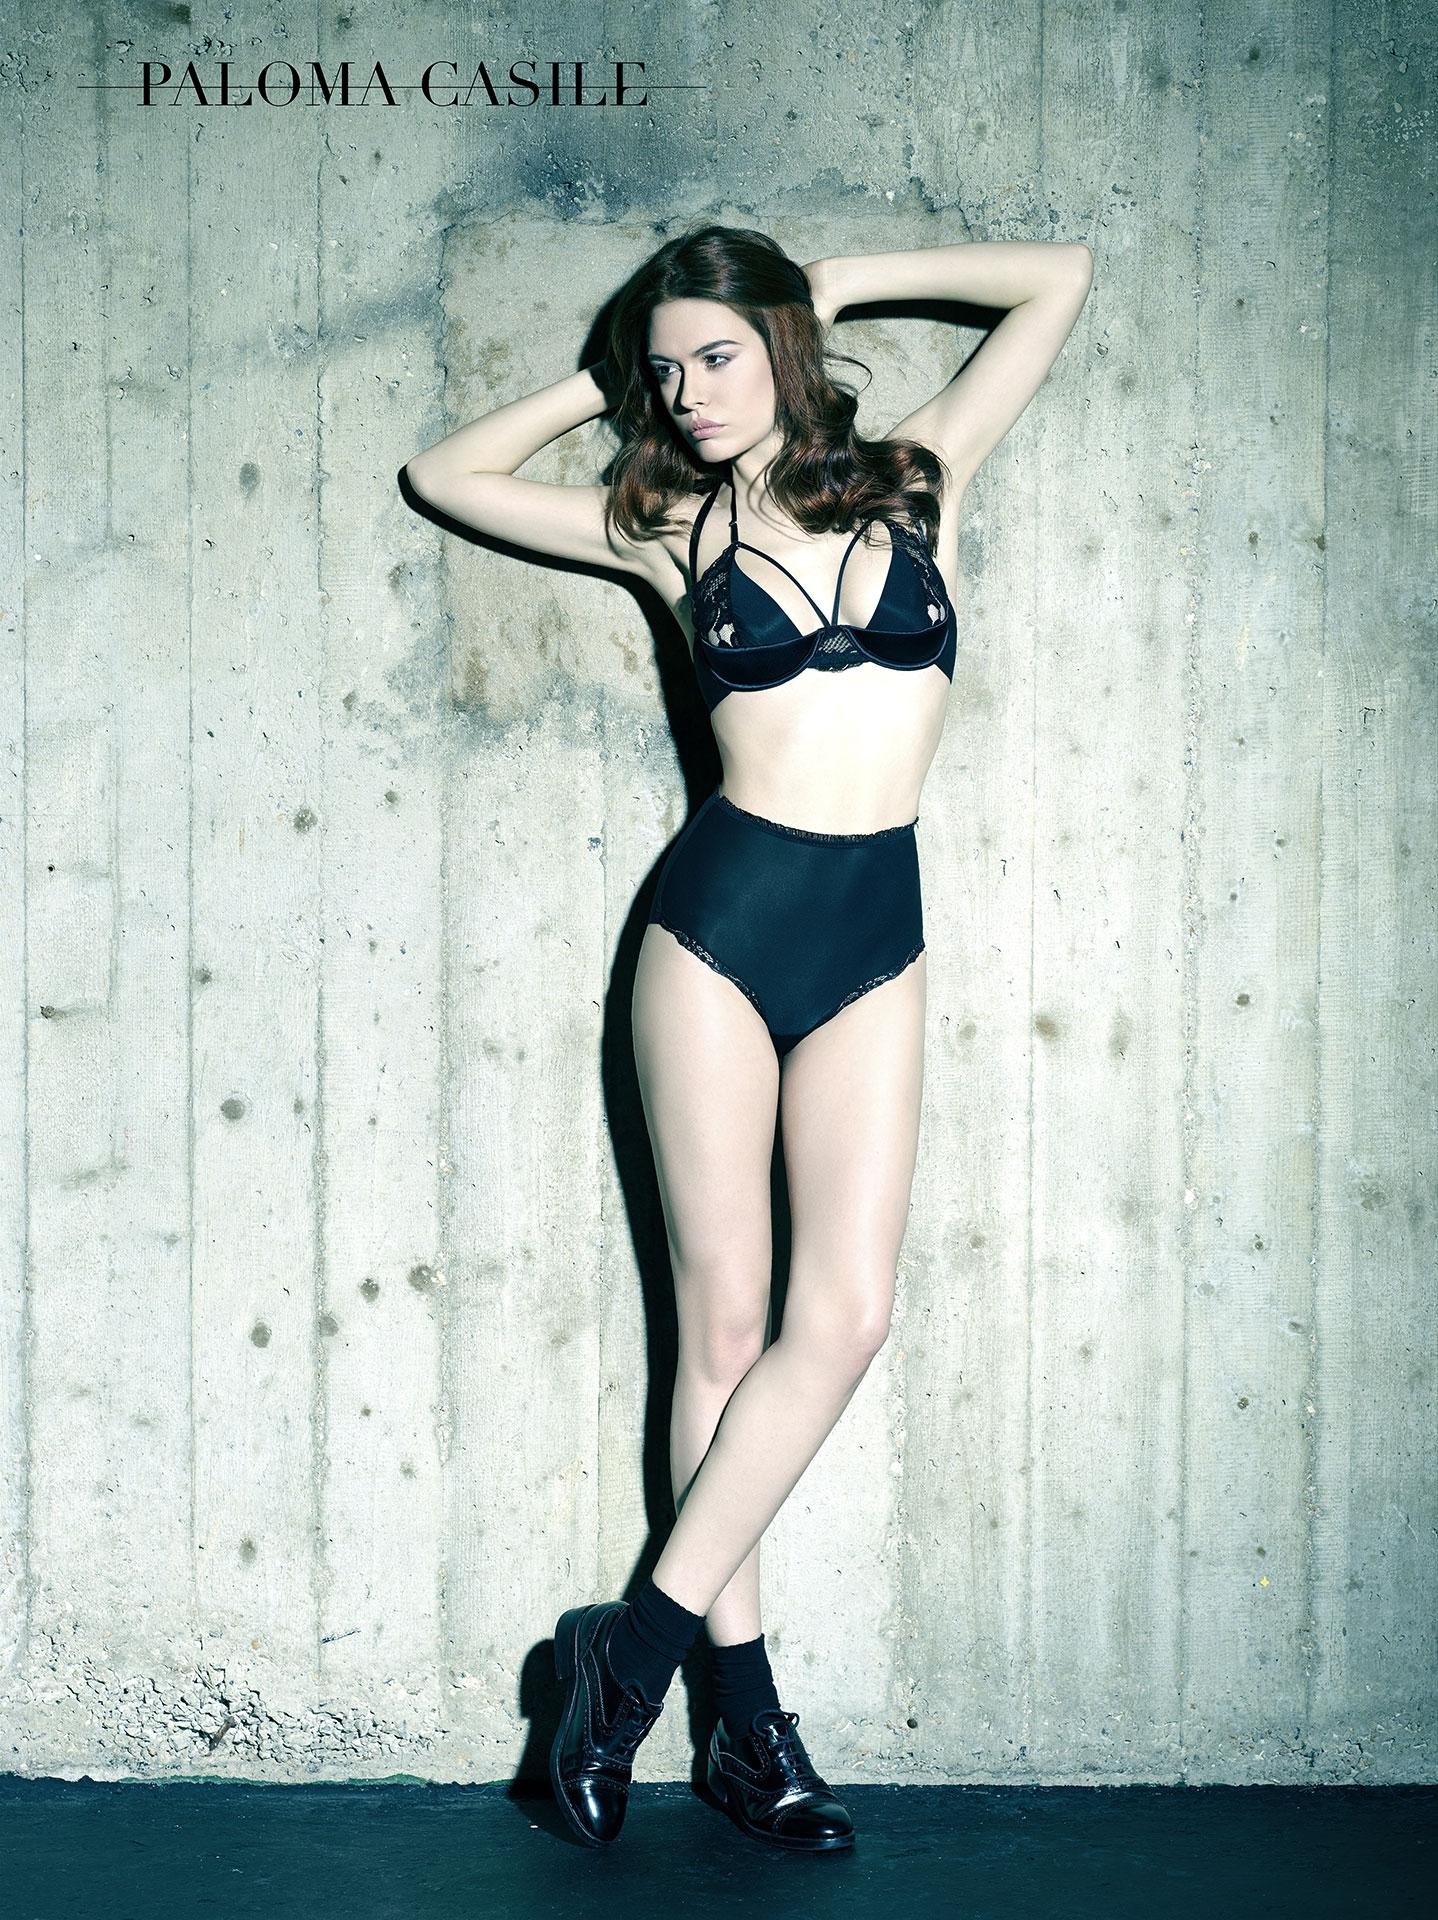 paloma casile aw 2015 campaign lingerie underwear frederic mercier fashion photographer one color